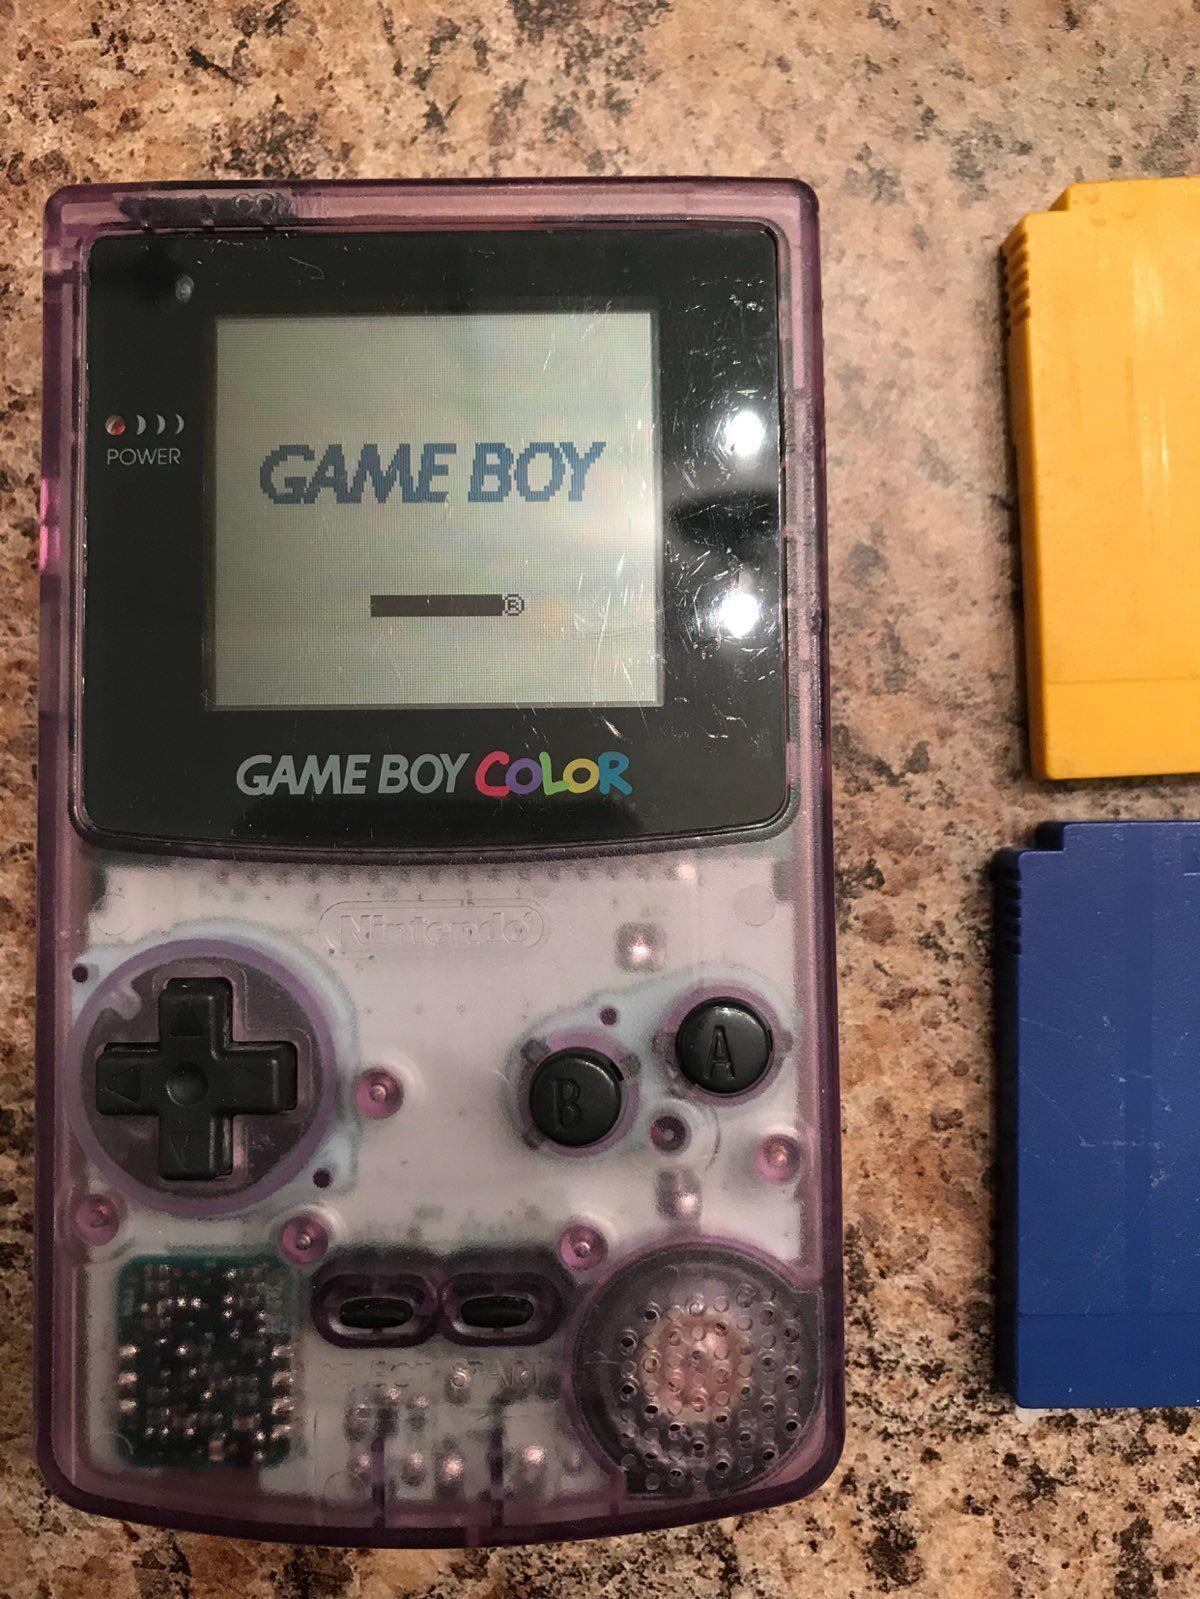 Pokemon games for gameboy color - Gameboy Color Plus 2 Pokemon Games